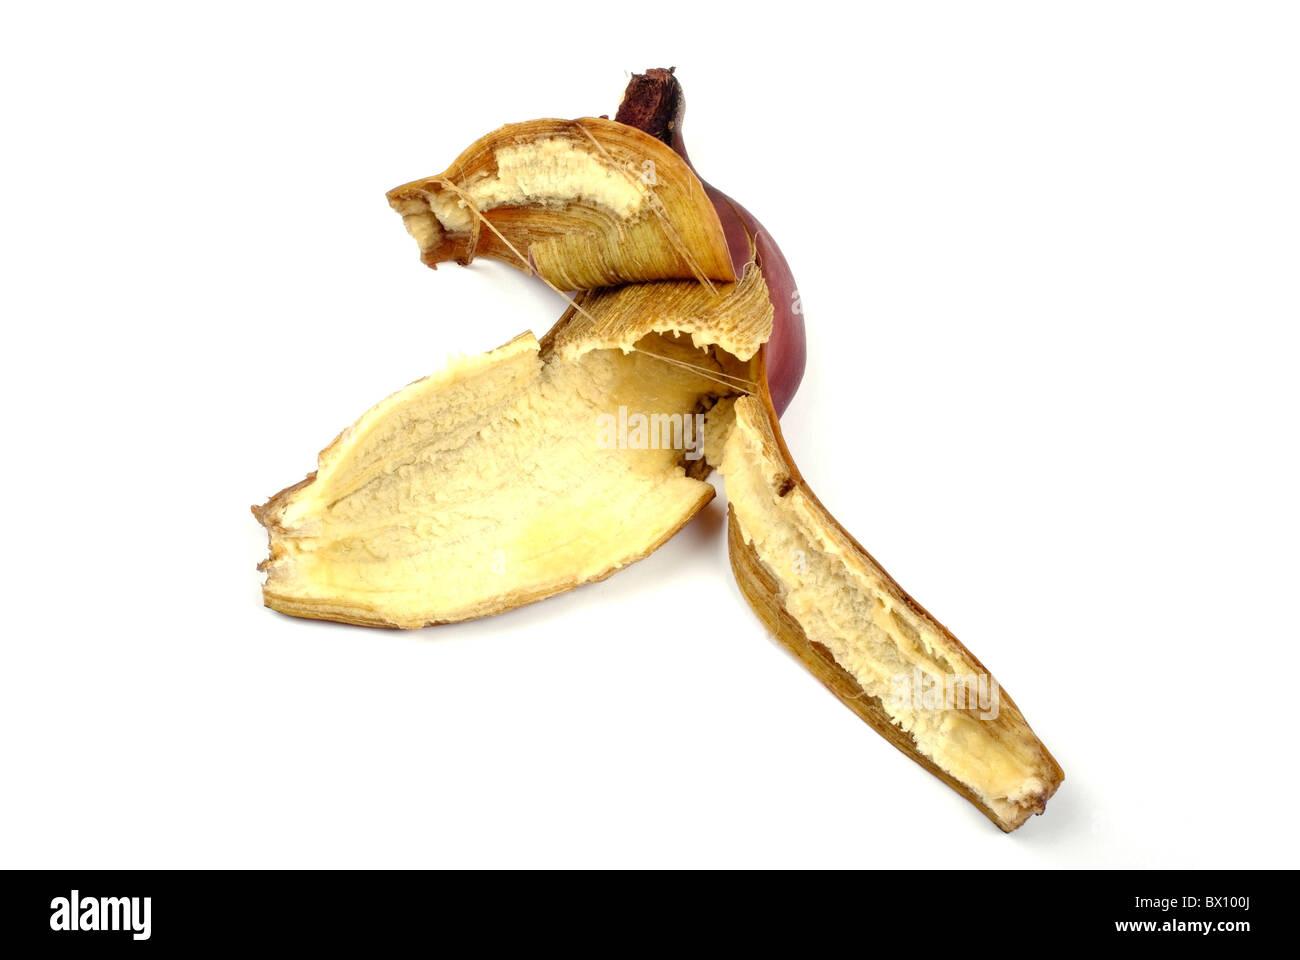 Red banana peel isolated on white background. - Stock Image